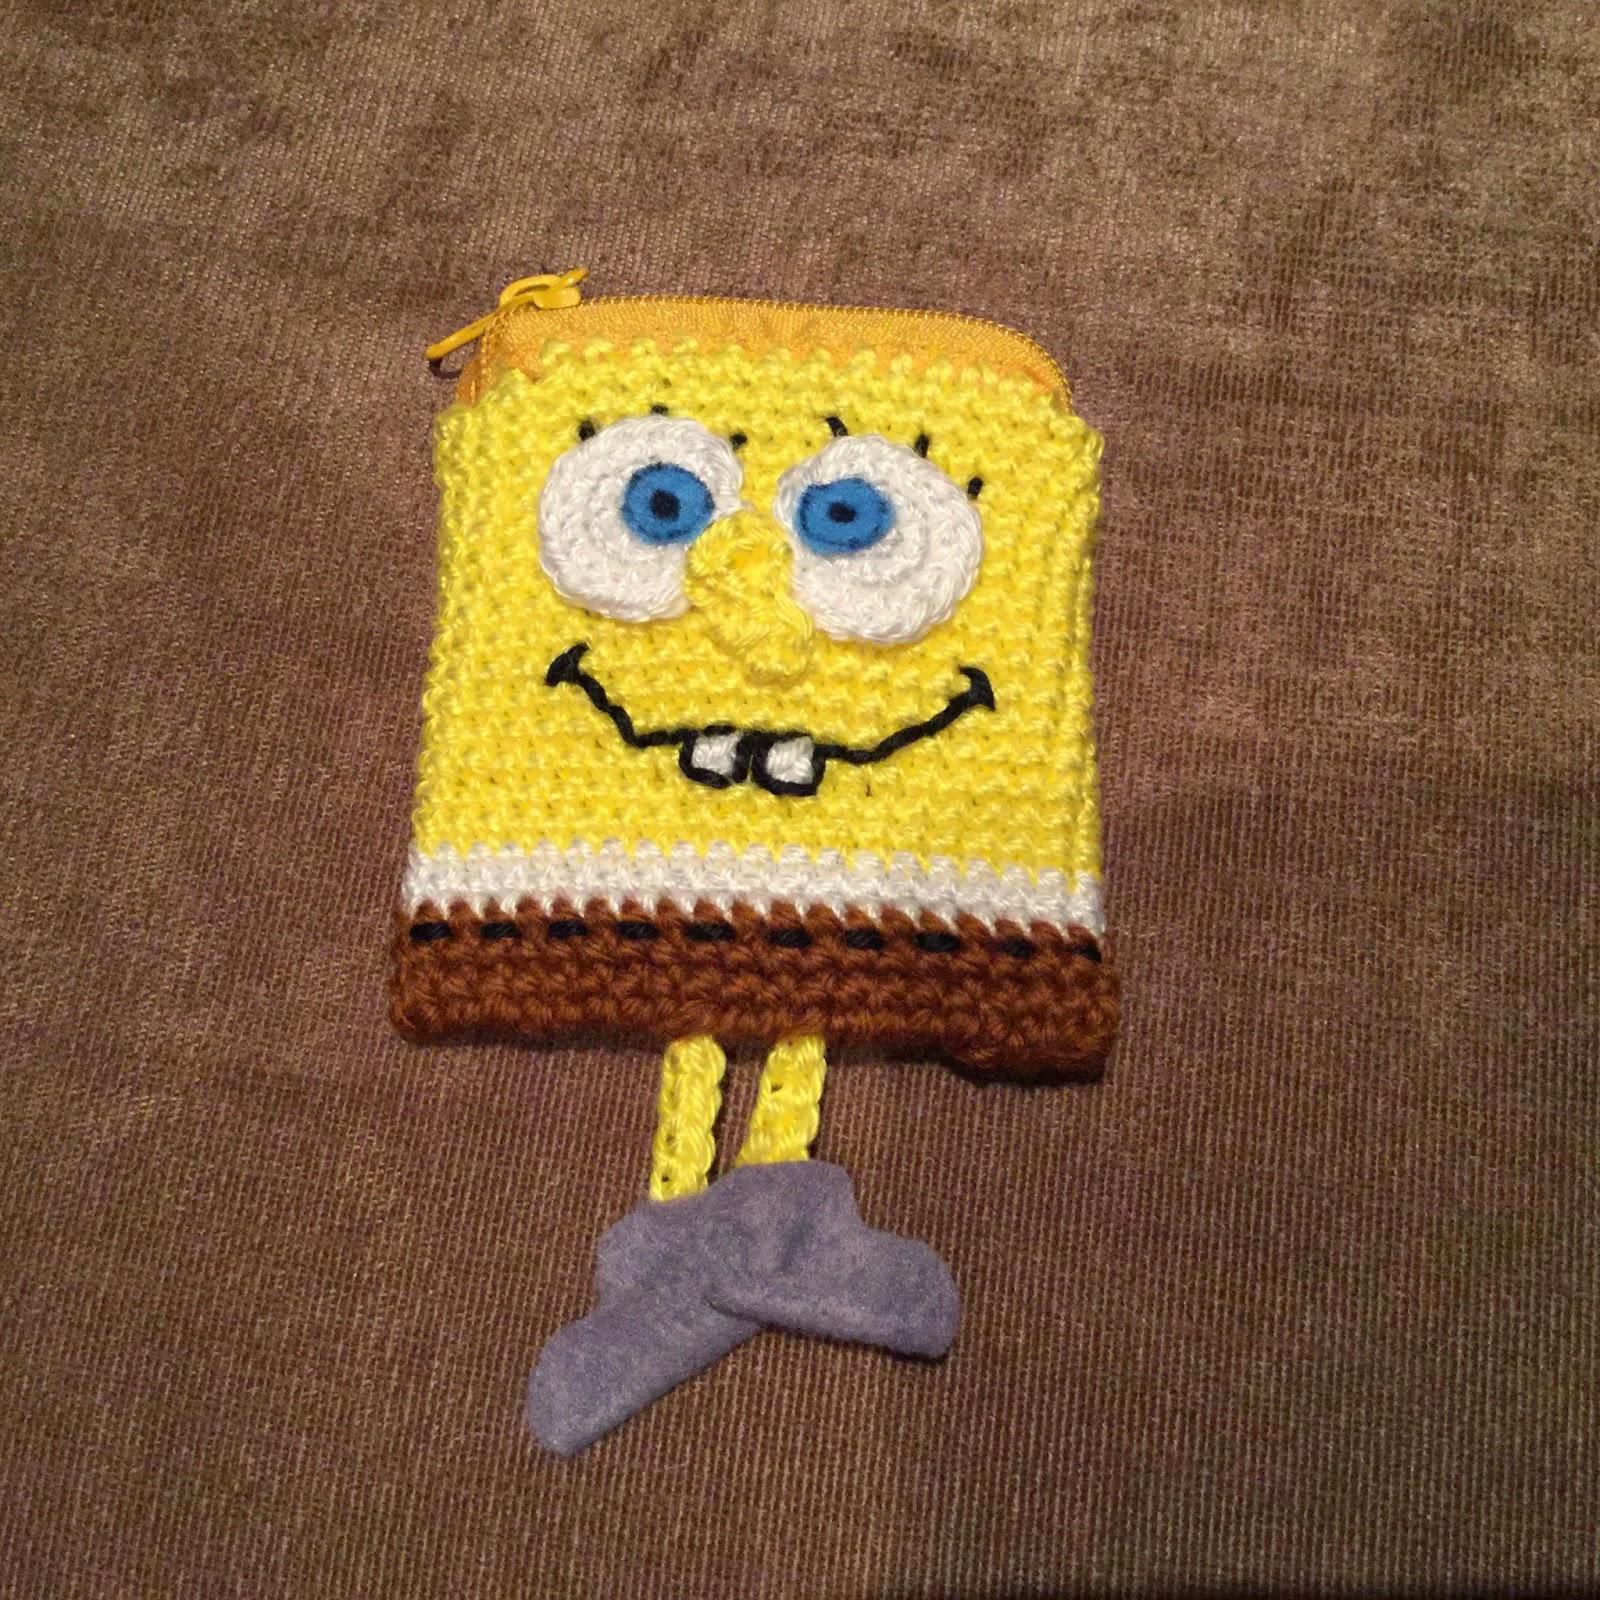 Spongebob Schwammkopf Minibörse - HANDMADE Kultur